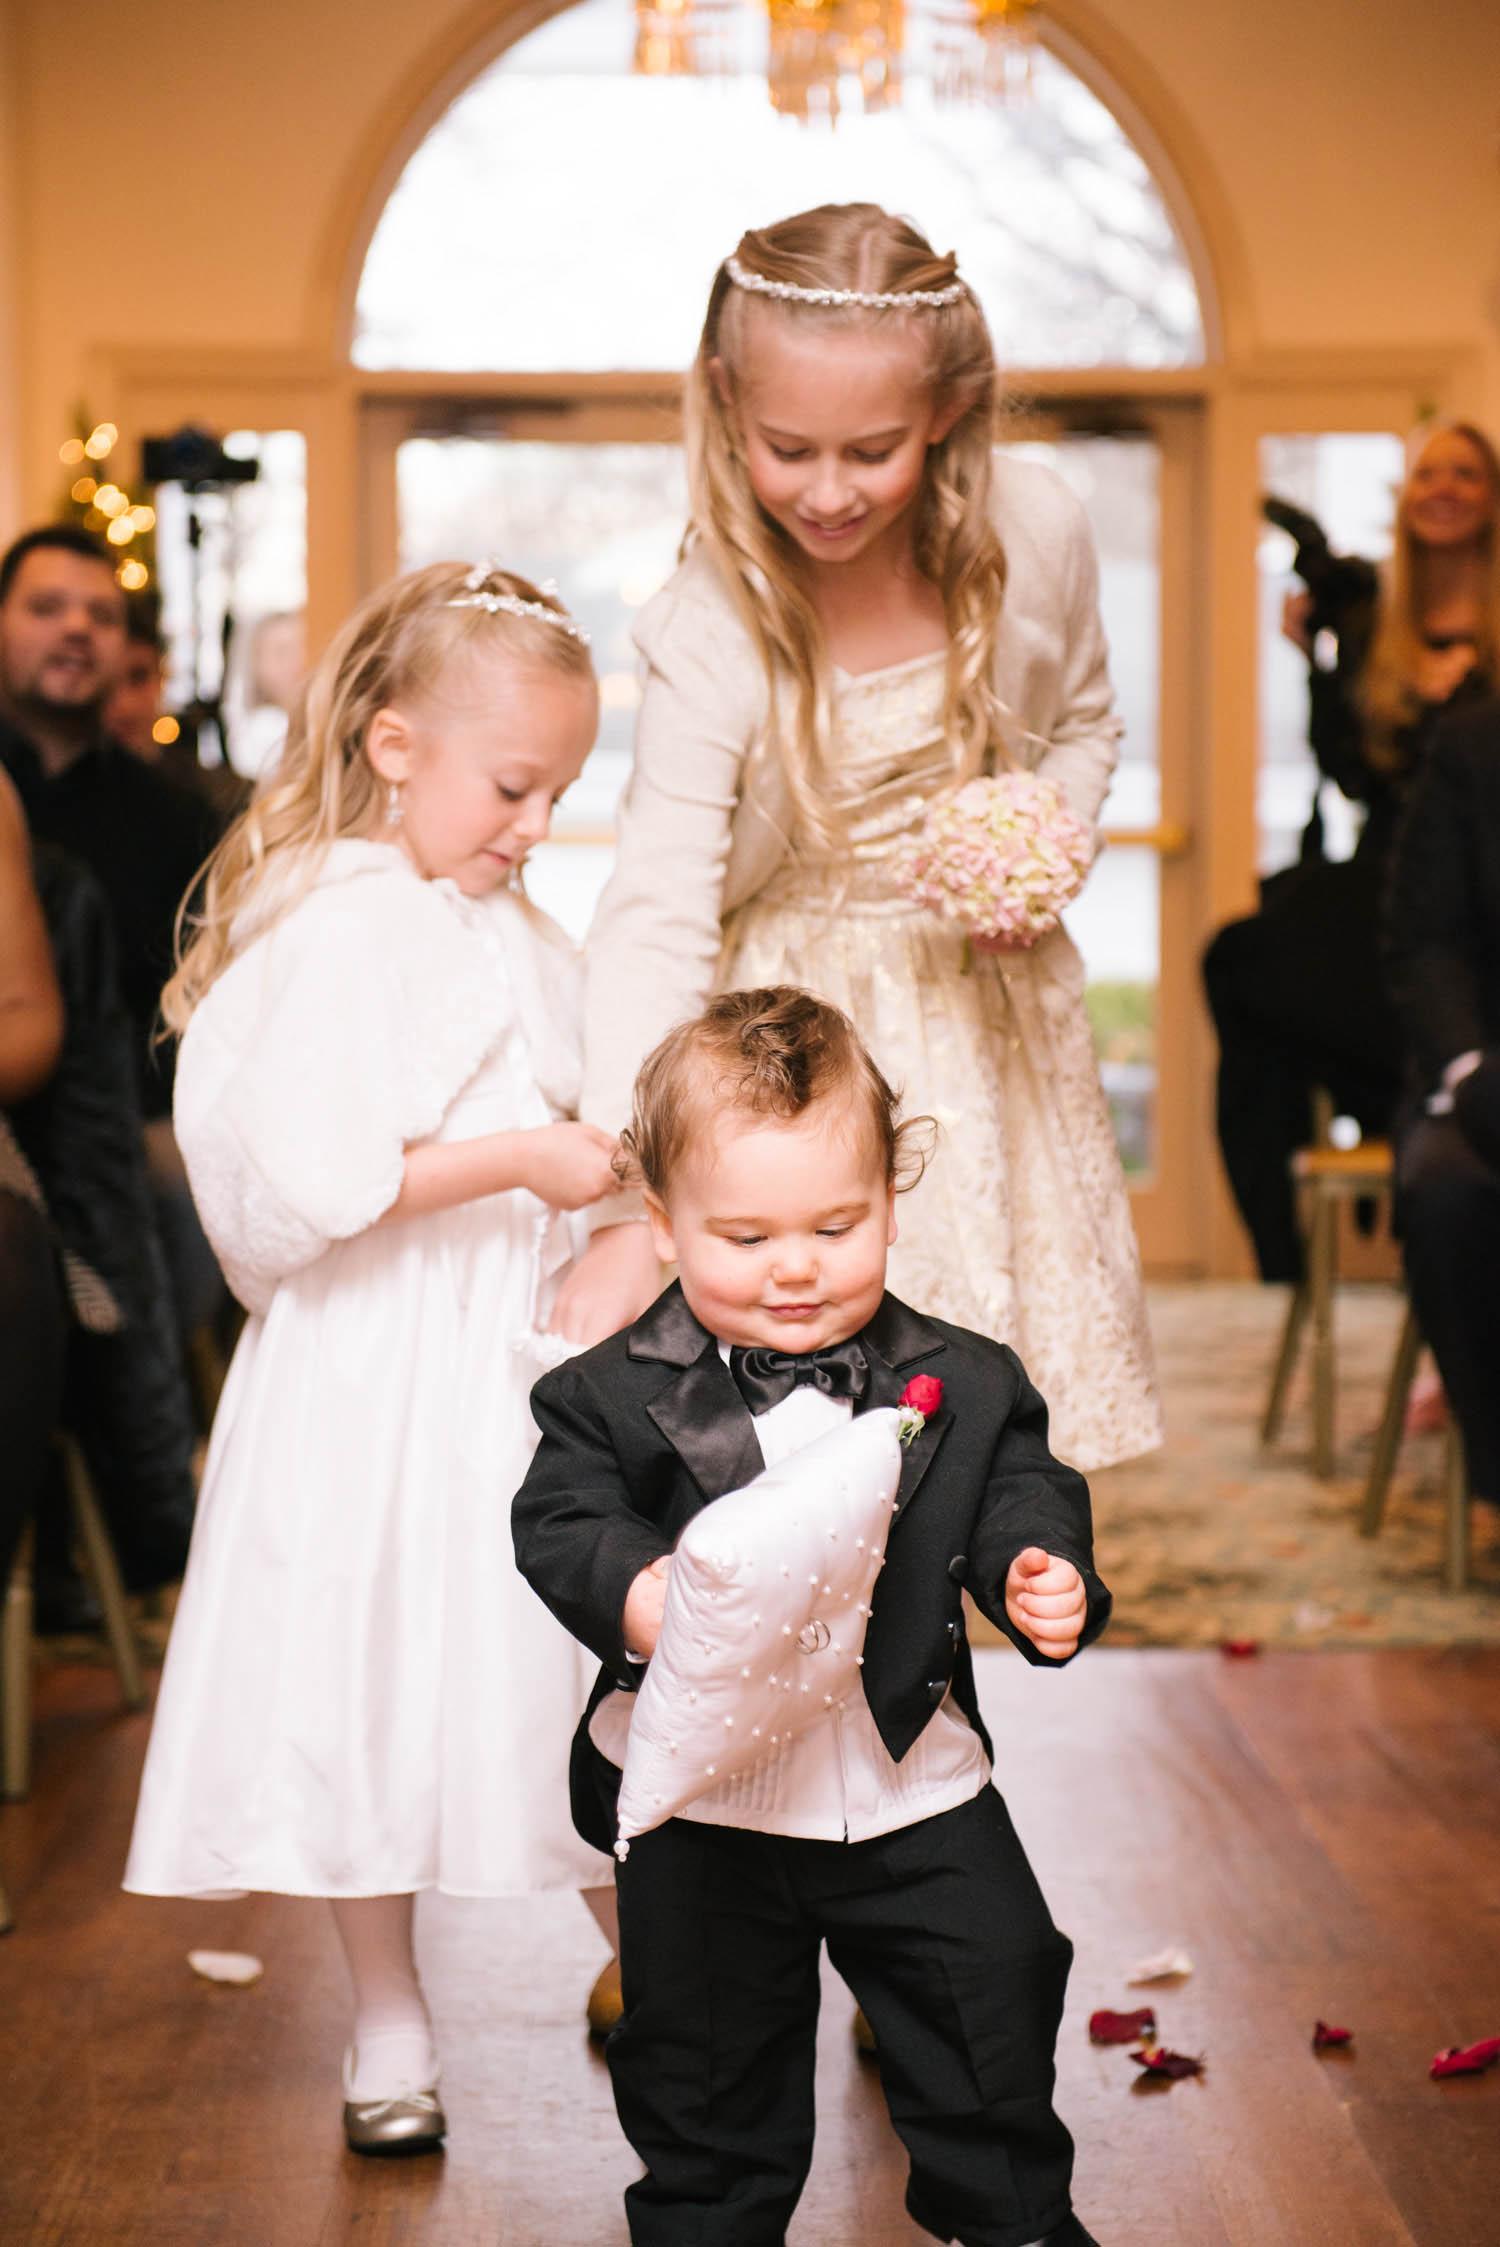 youngstrom-wedding-105.jpg